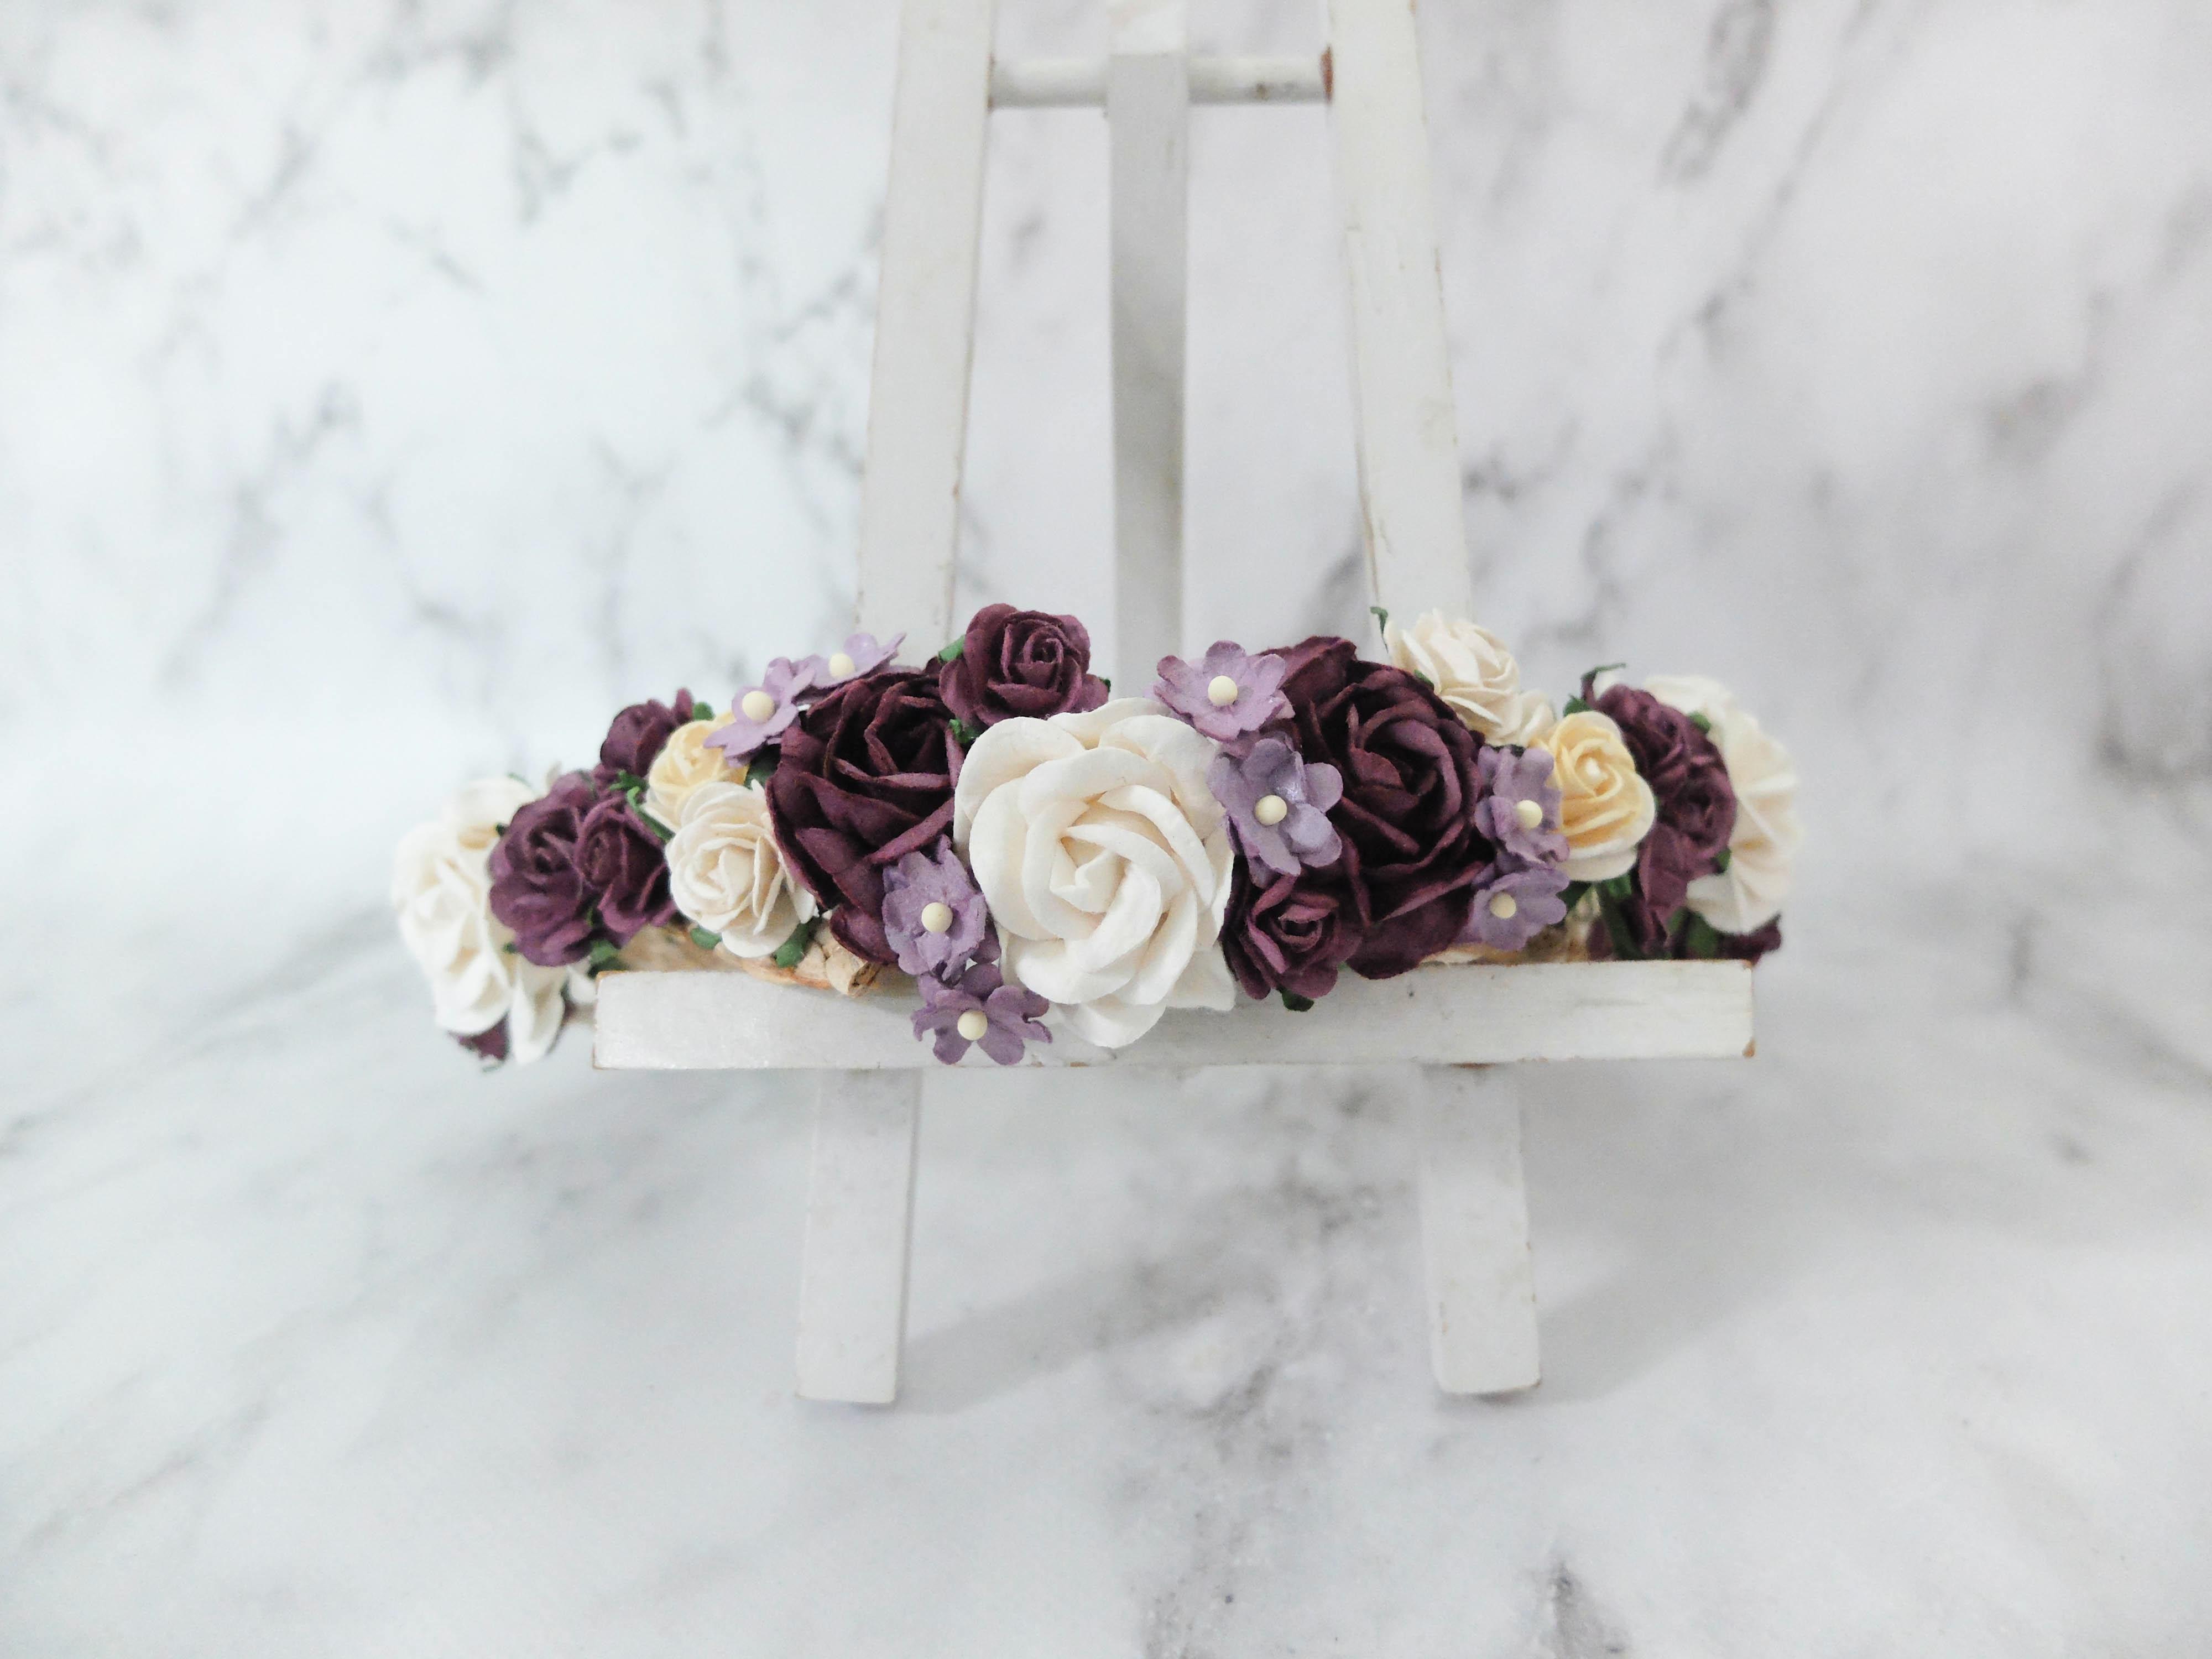 Plum cream wedding flower crown girl bridal adult hair accessories